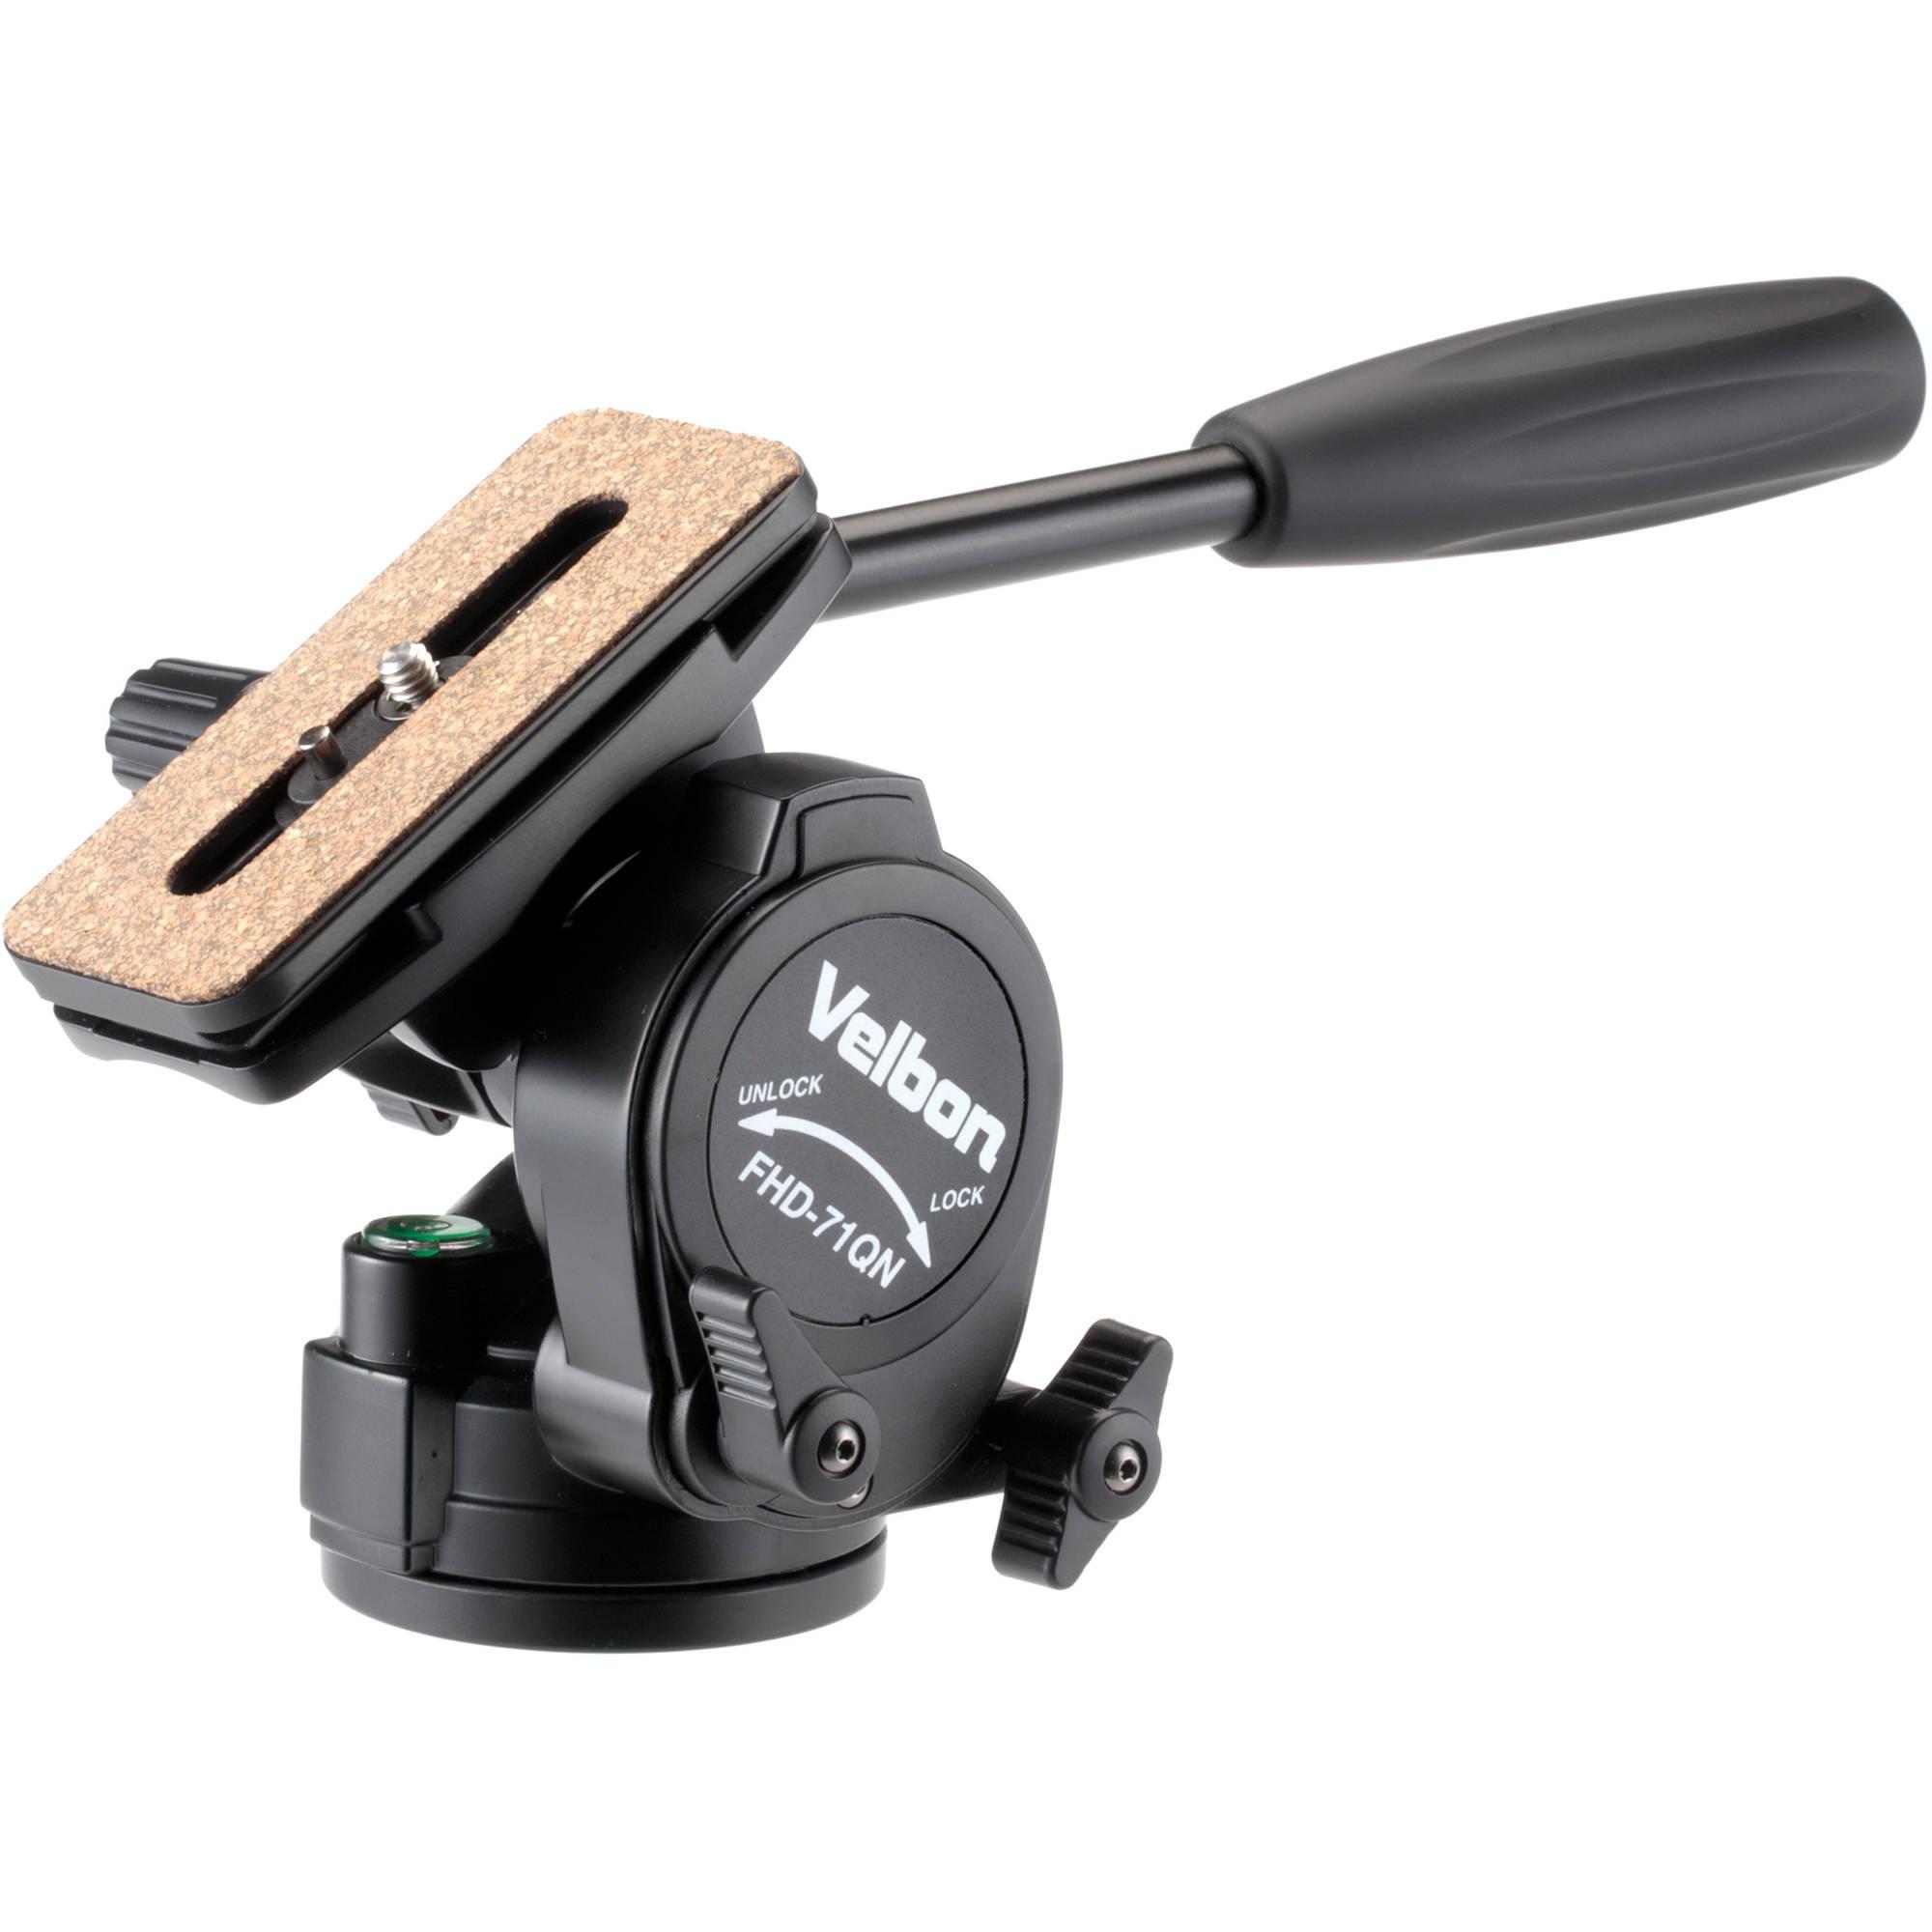 Velbon FHD-71QN 2-Way Fluid Pan Head